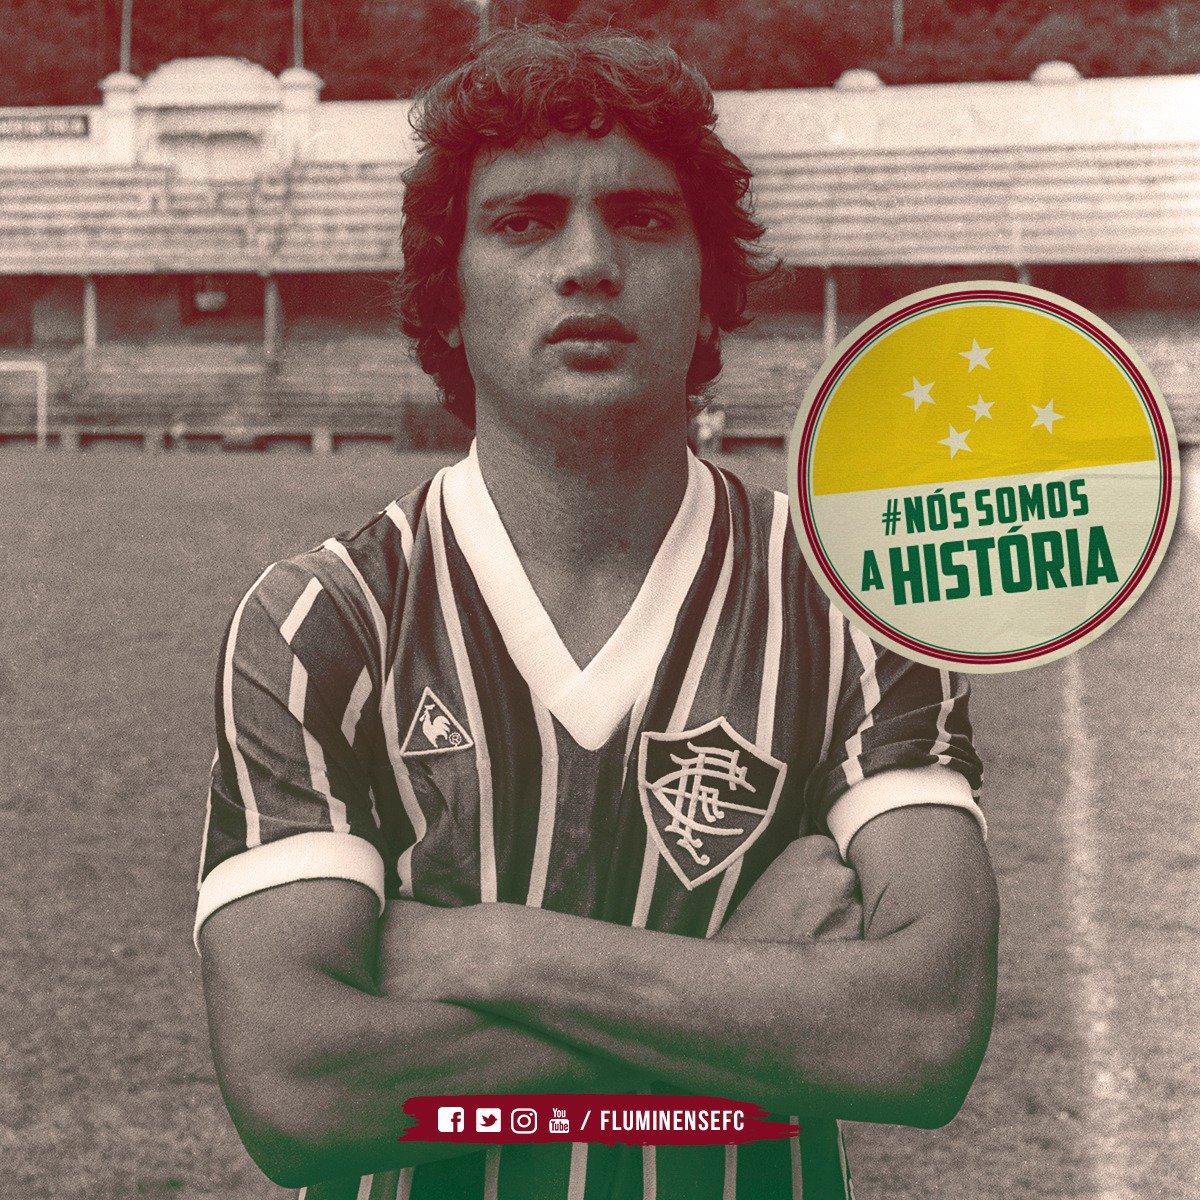 70eccb7a98 Fluminense F.C. on Twitter